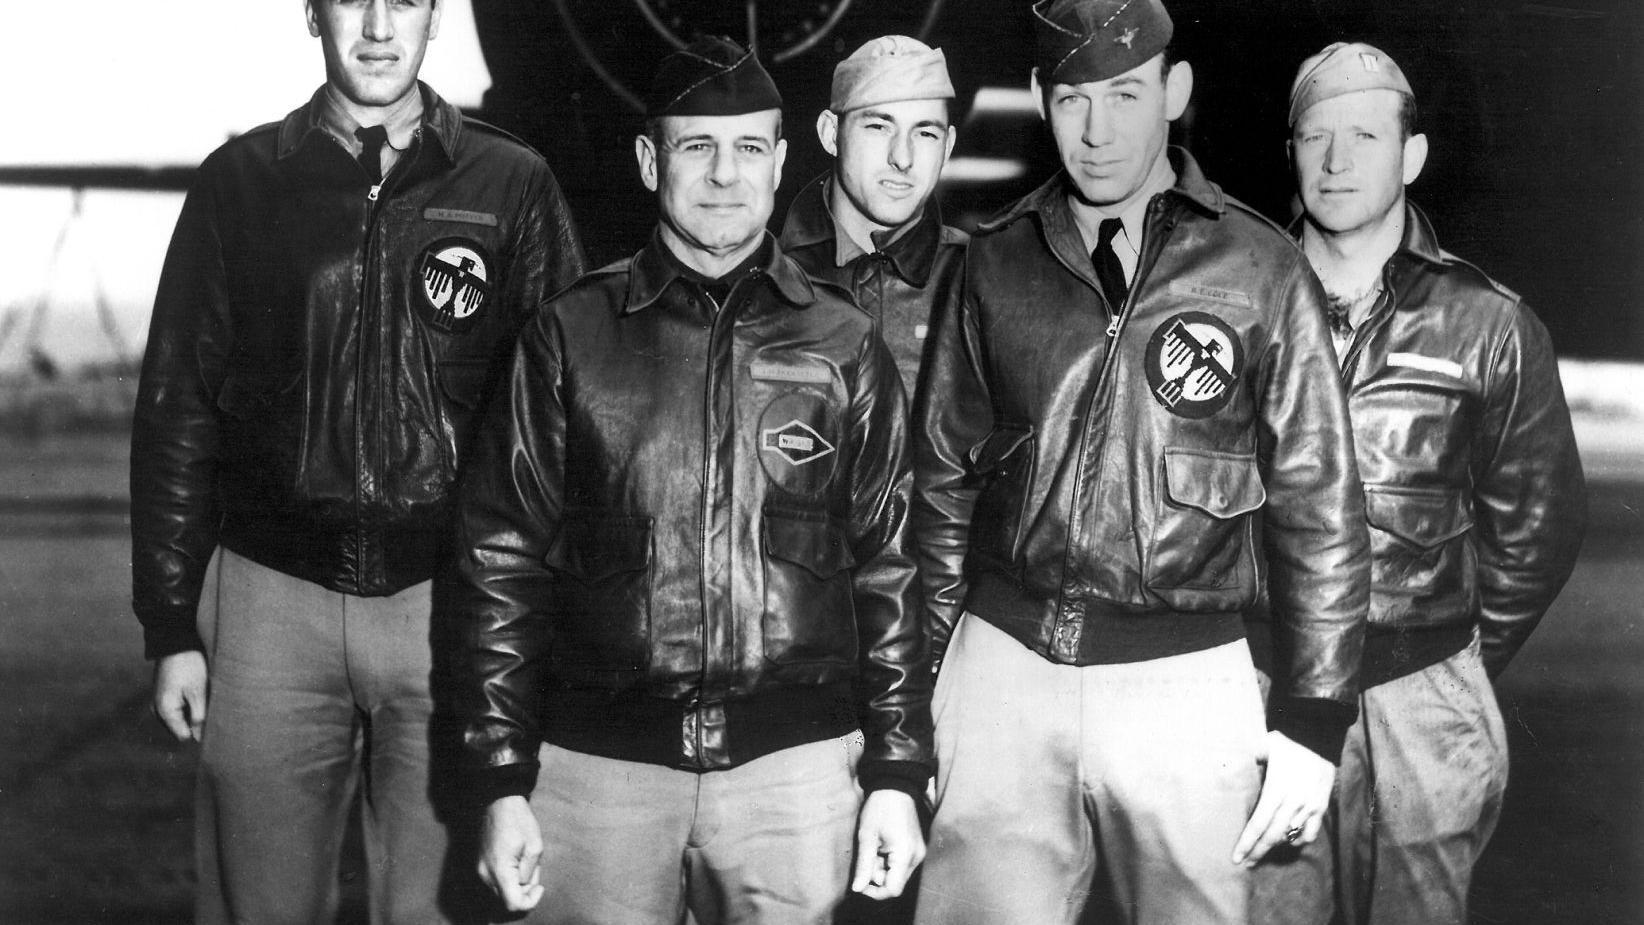 Military Museum display honors famed Doolittle Raid